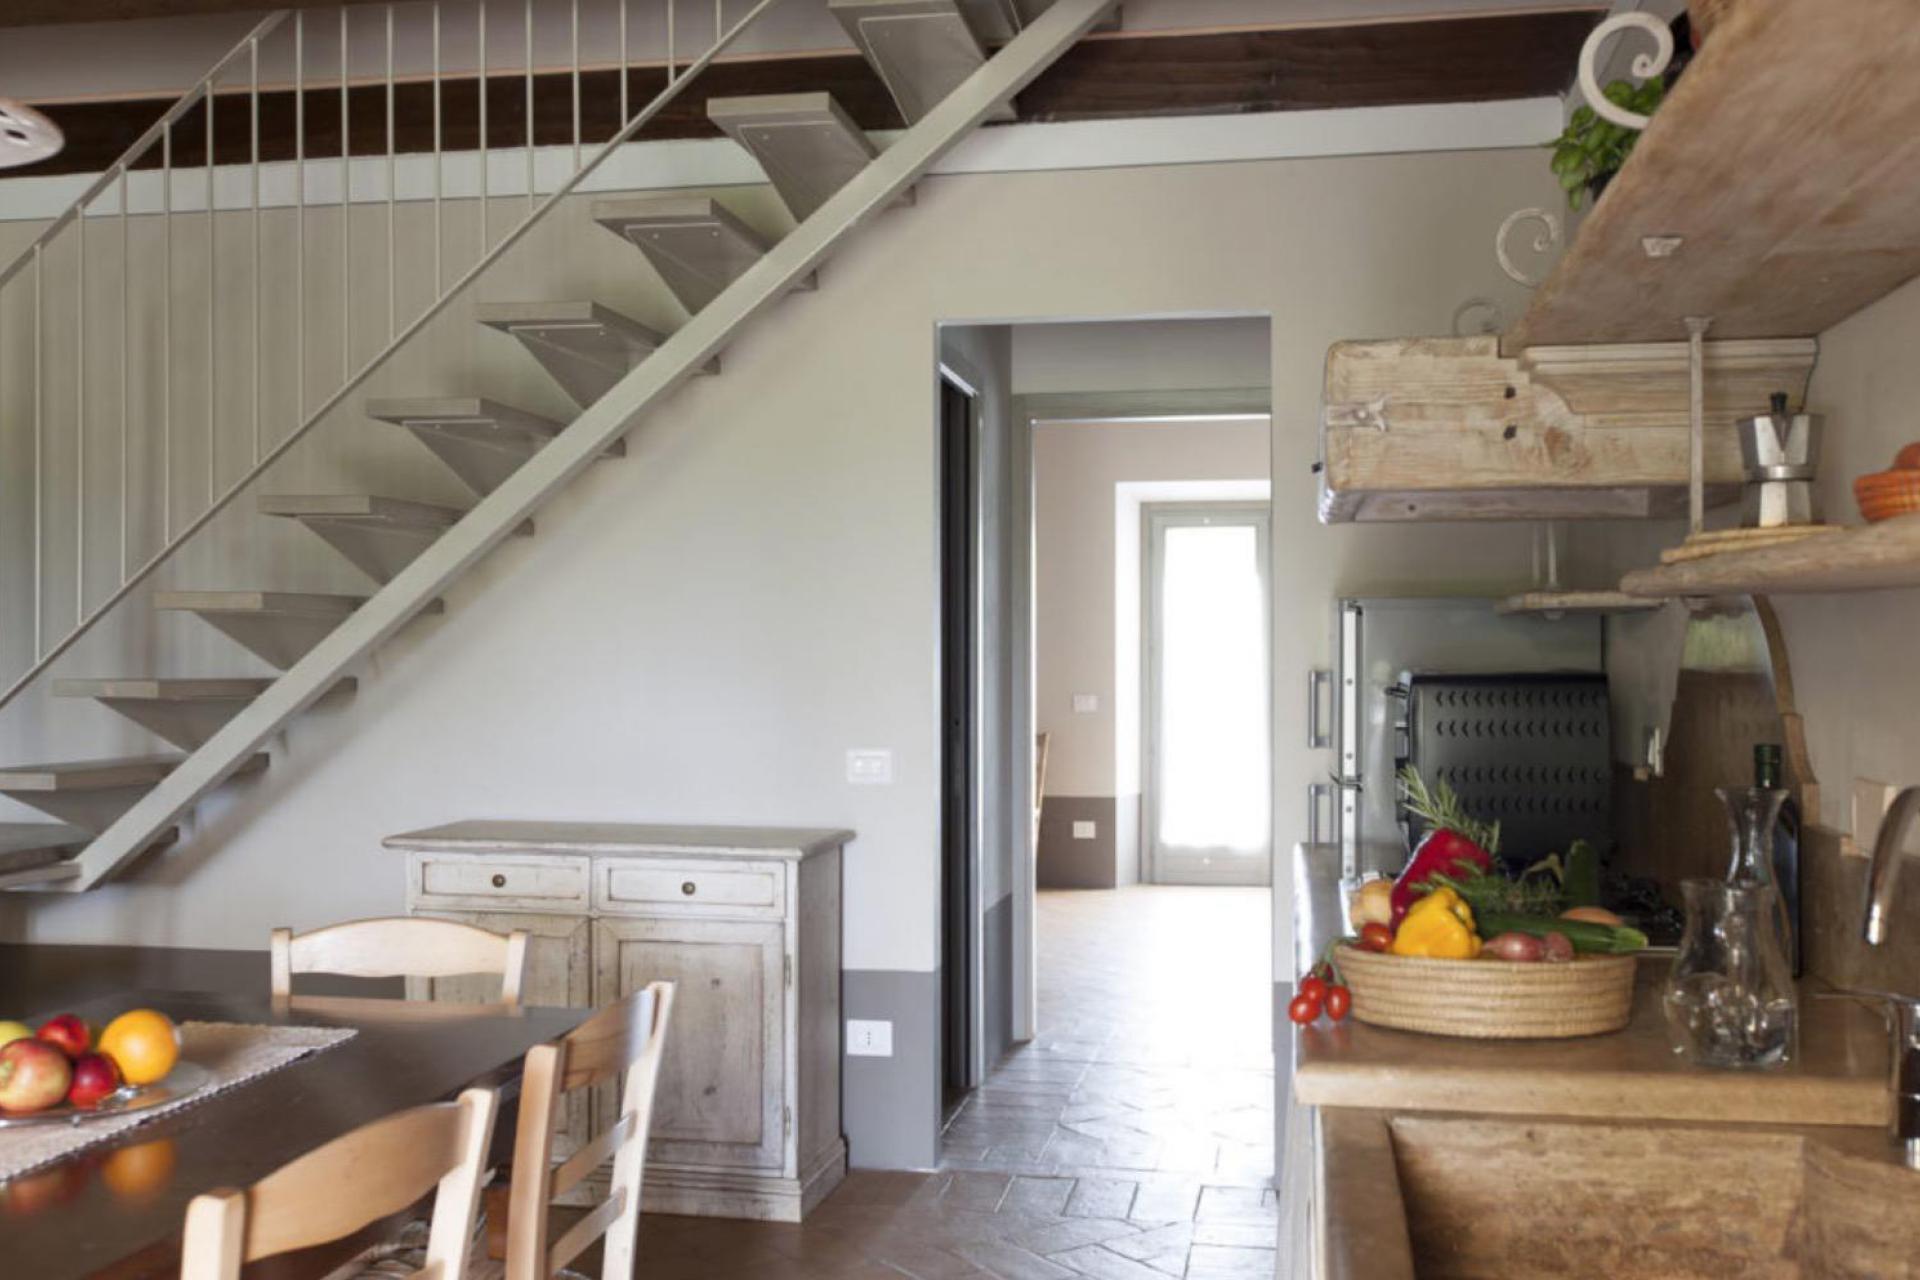 Agriturismo Toskana 9 Wohnungen auf Olivenhof in der Toskana   myitalyselection.de